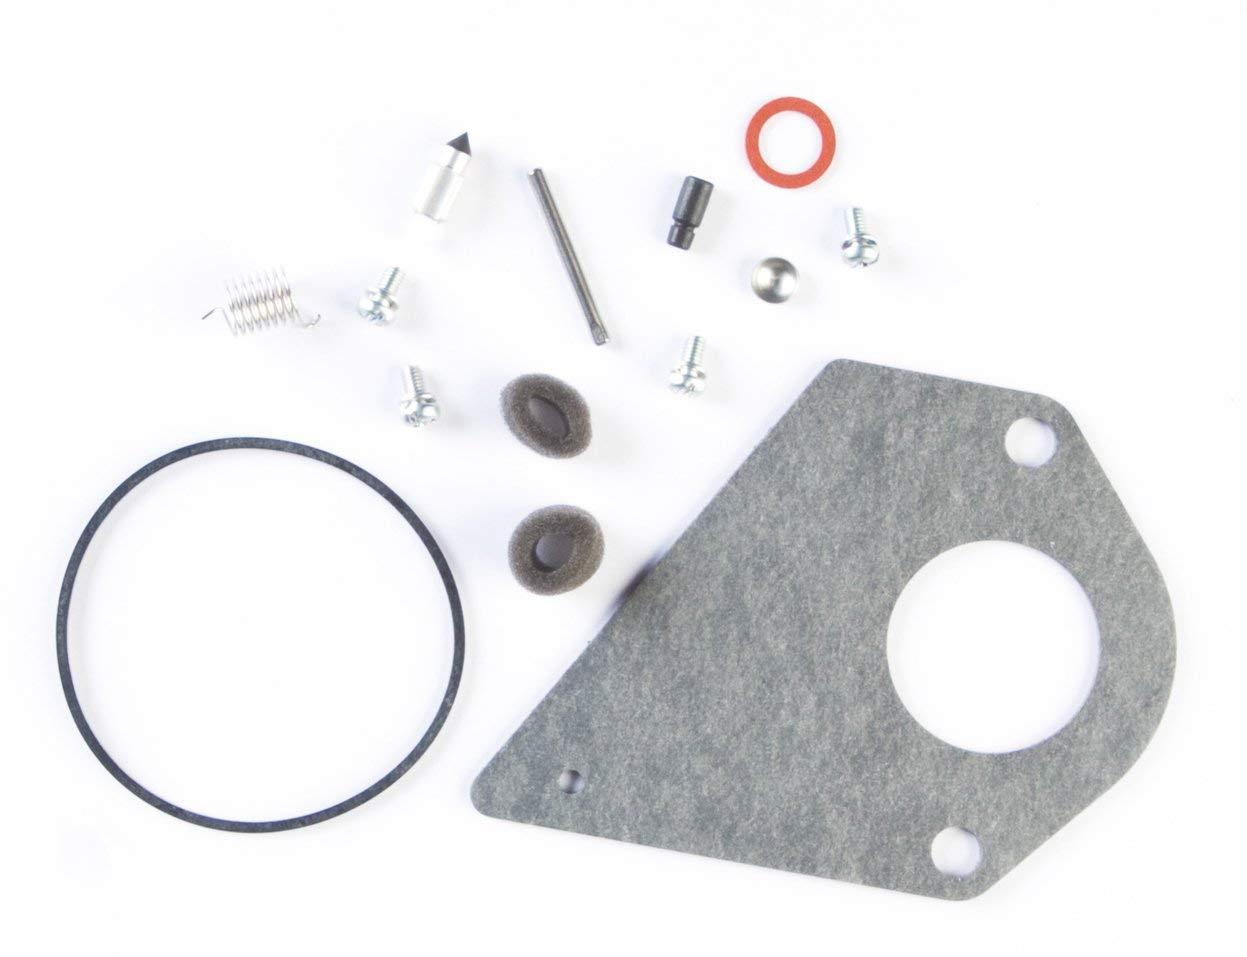 Briggs & Stratton 694930 Carburetor Overhaul Kit Replacement Part